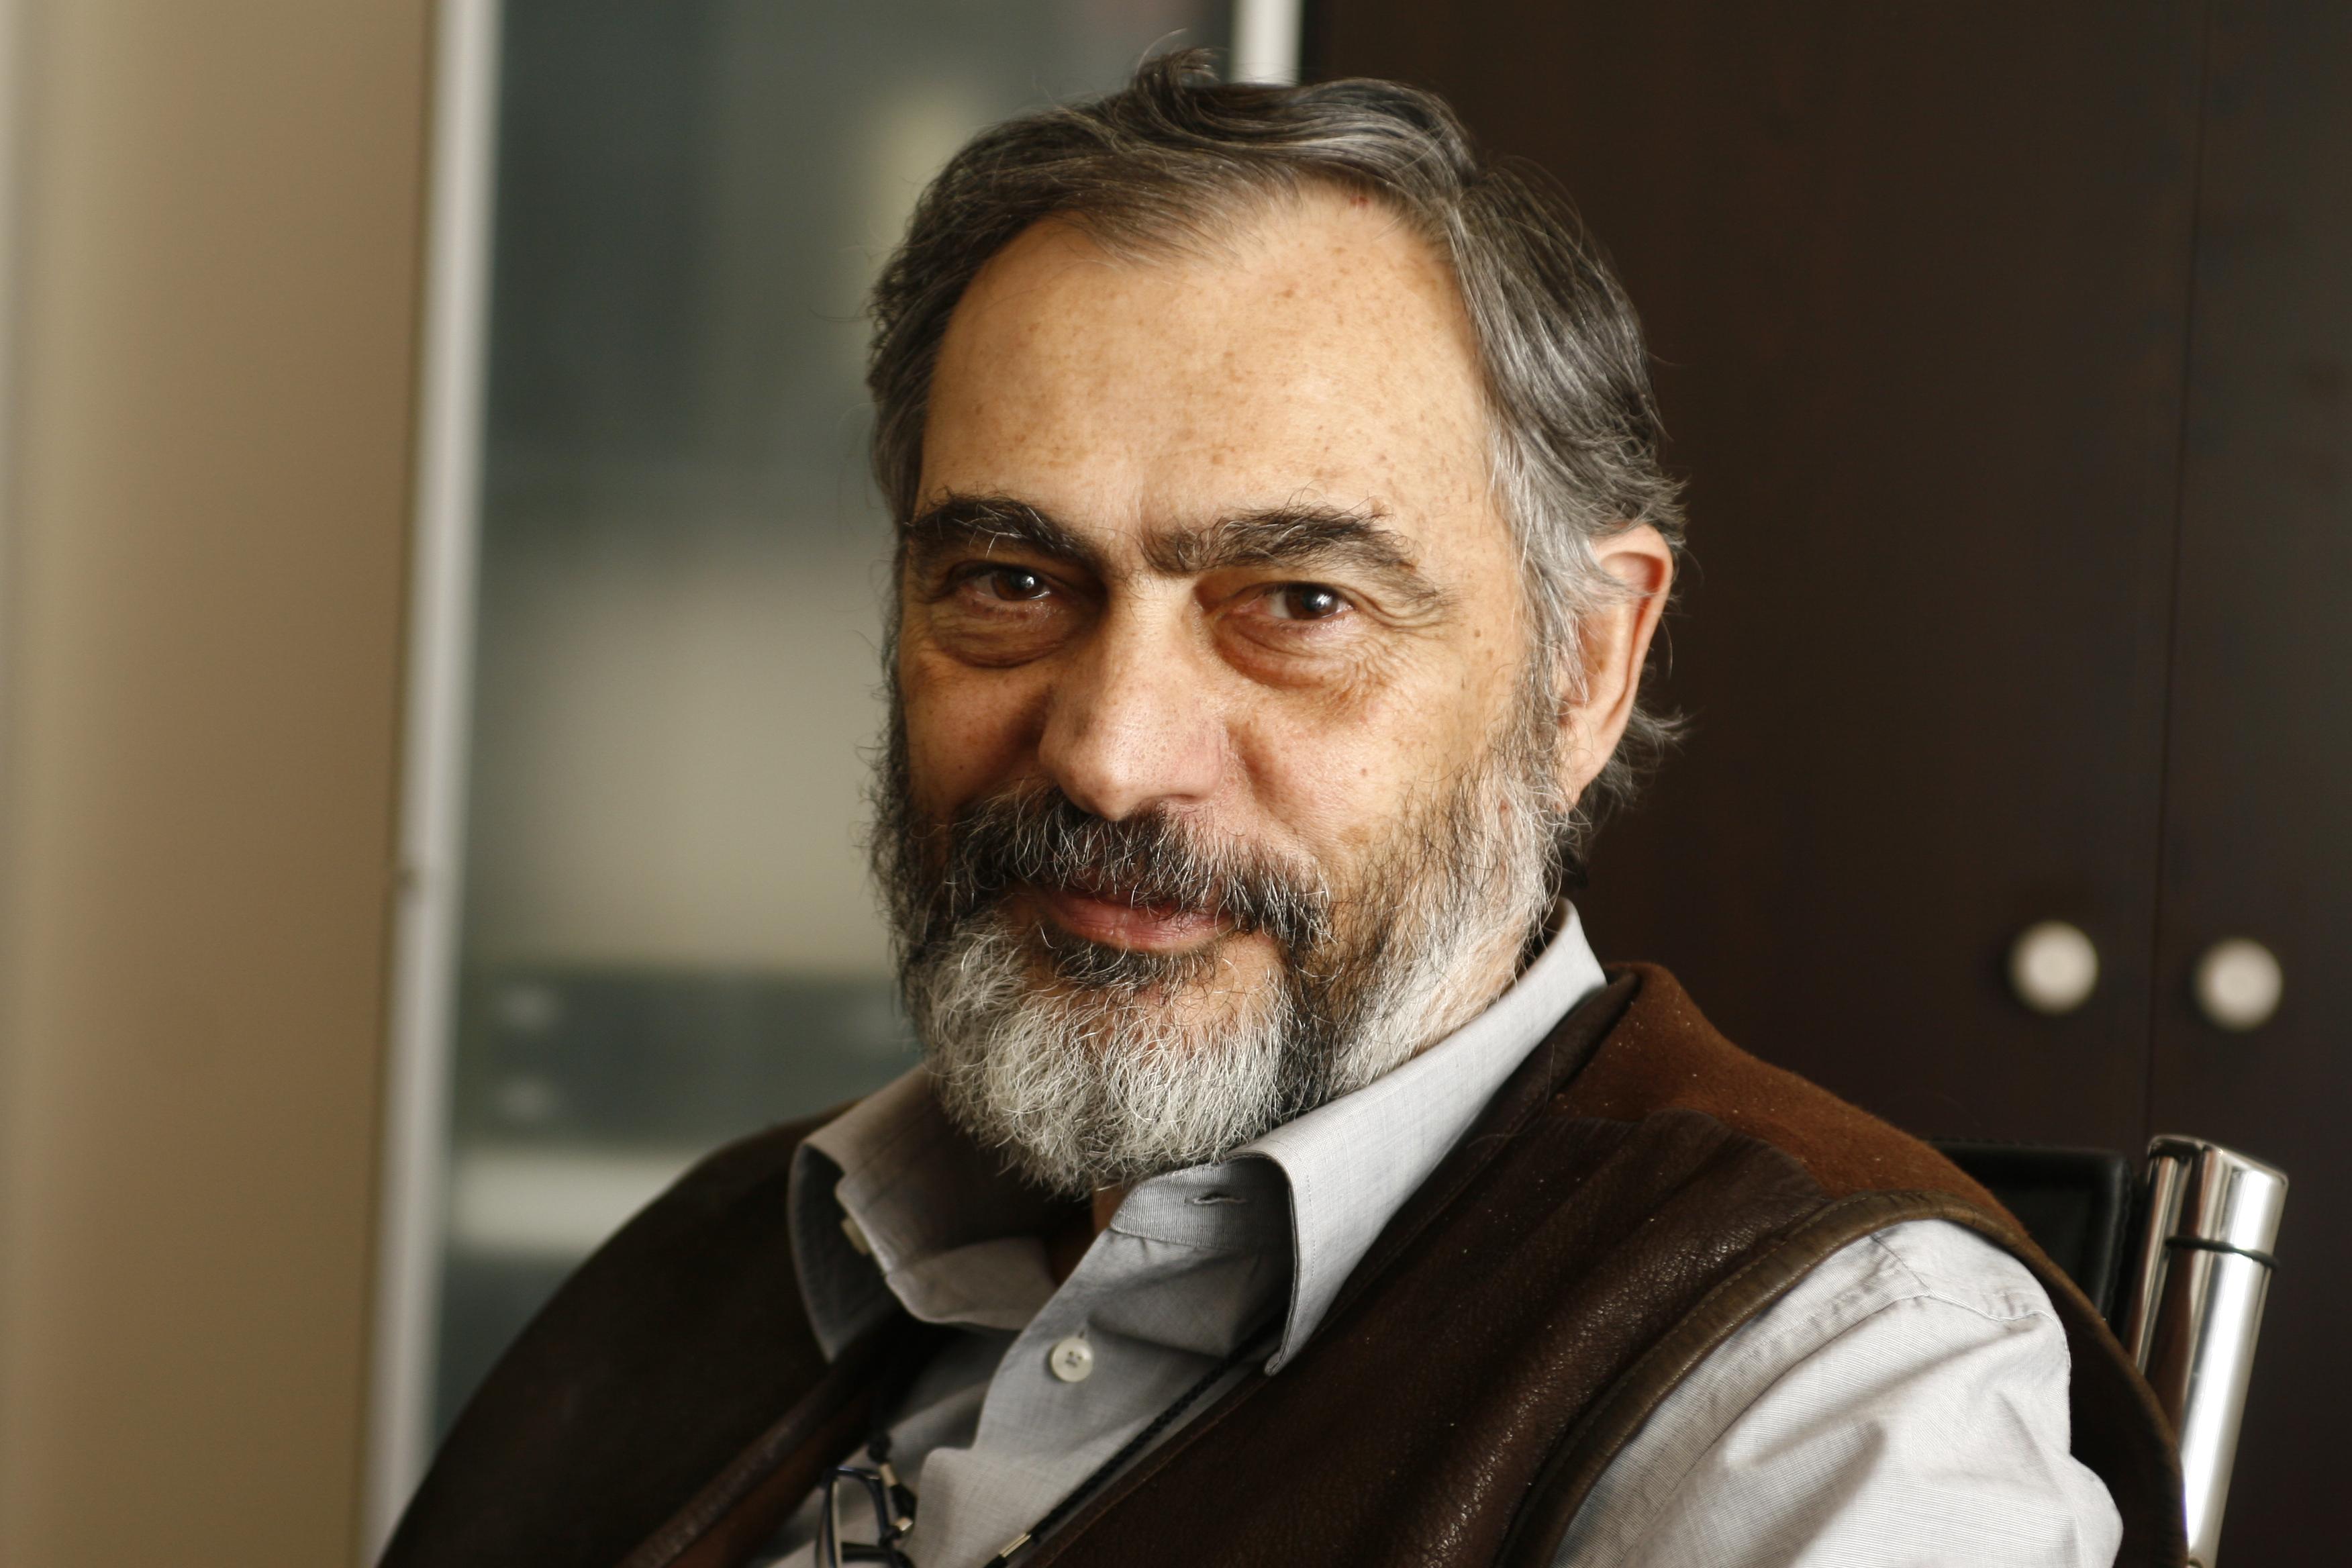 The Armenian advisor of Ahmet Davutoglu